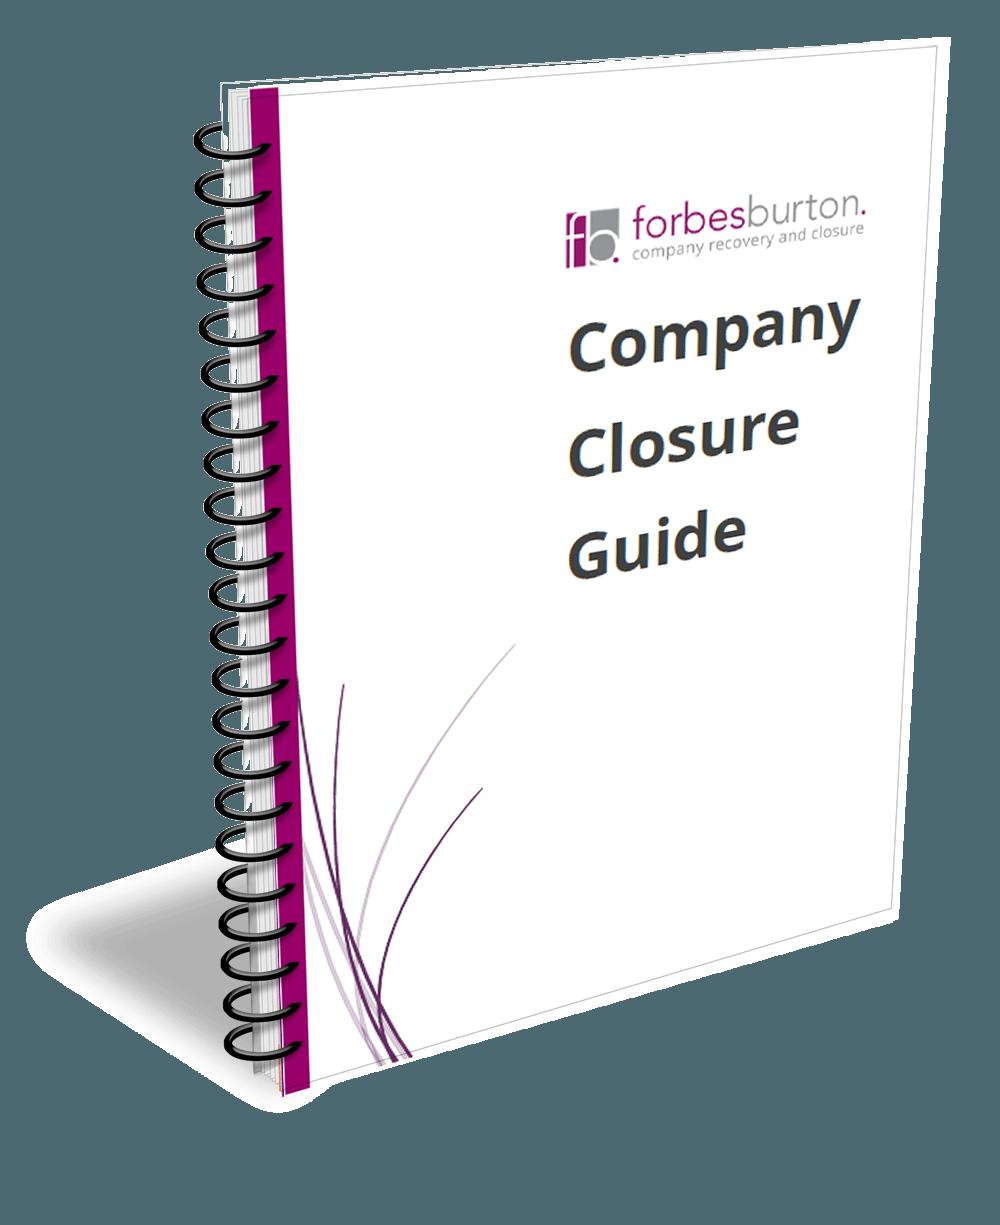 closure-book-cover